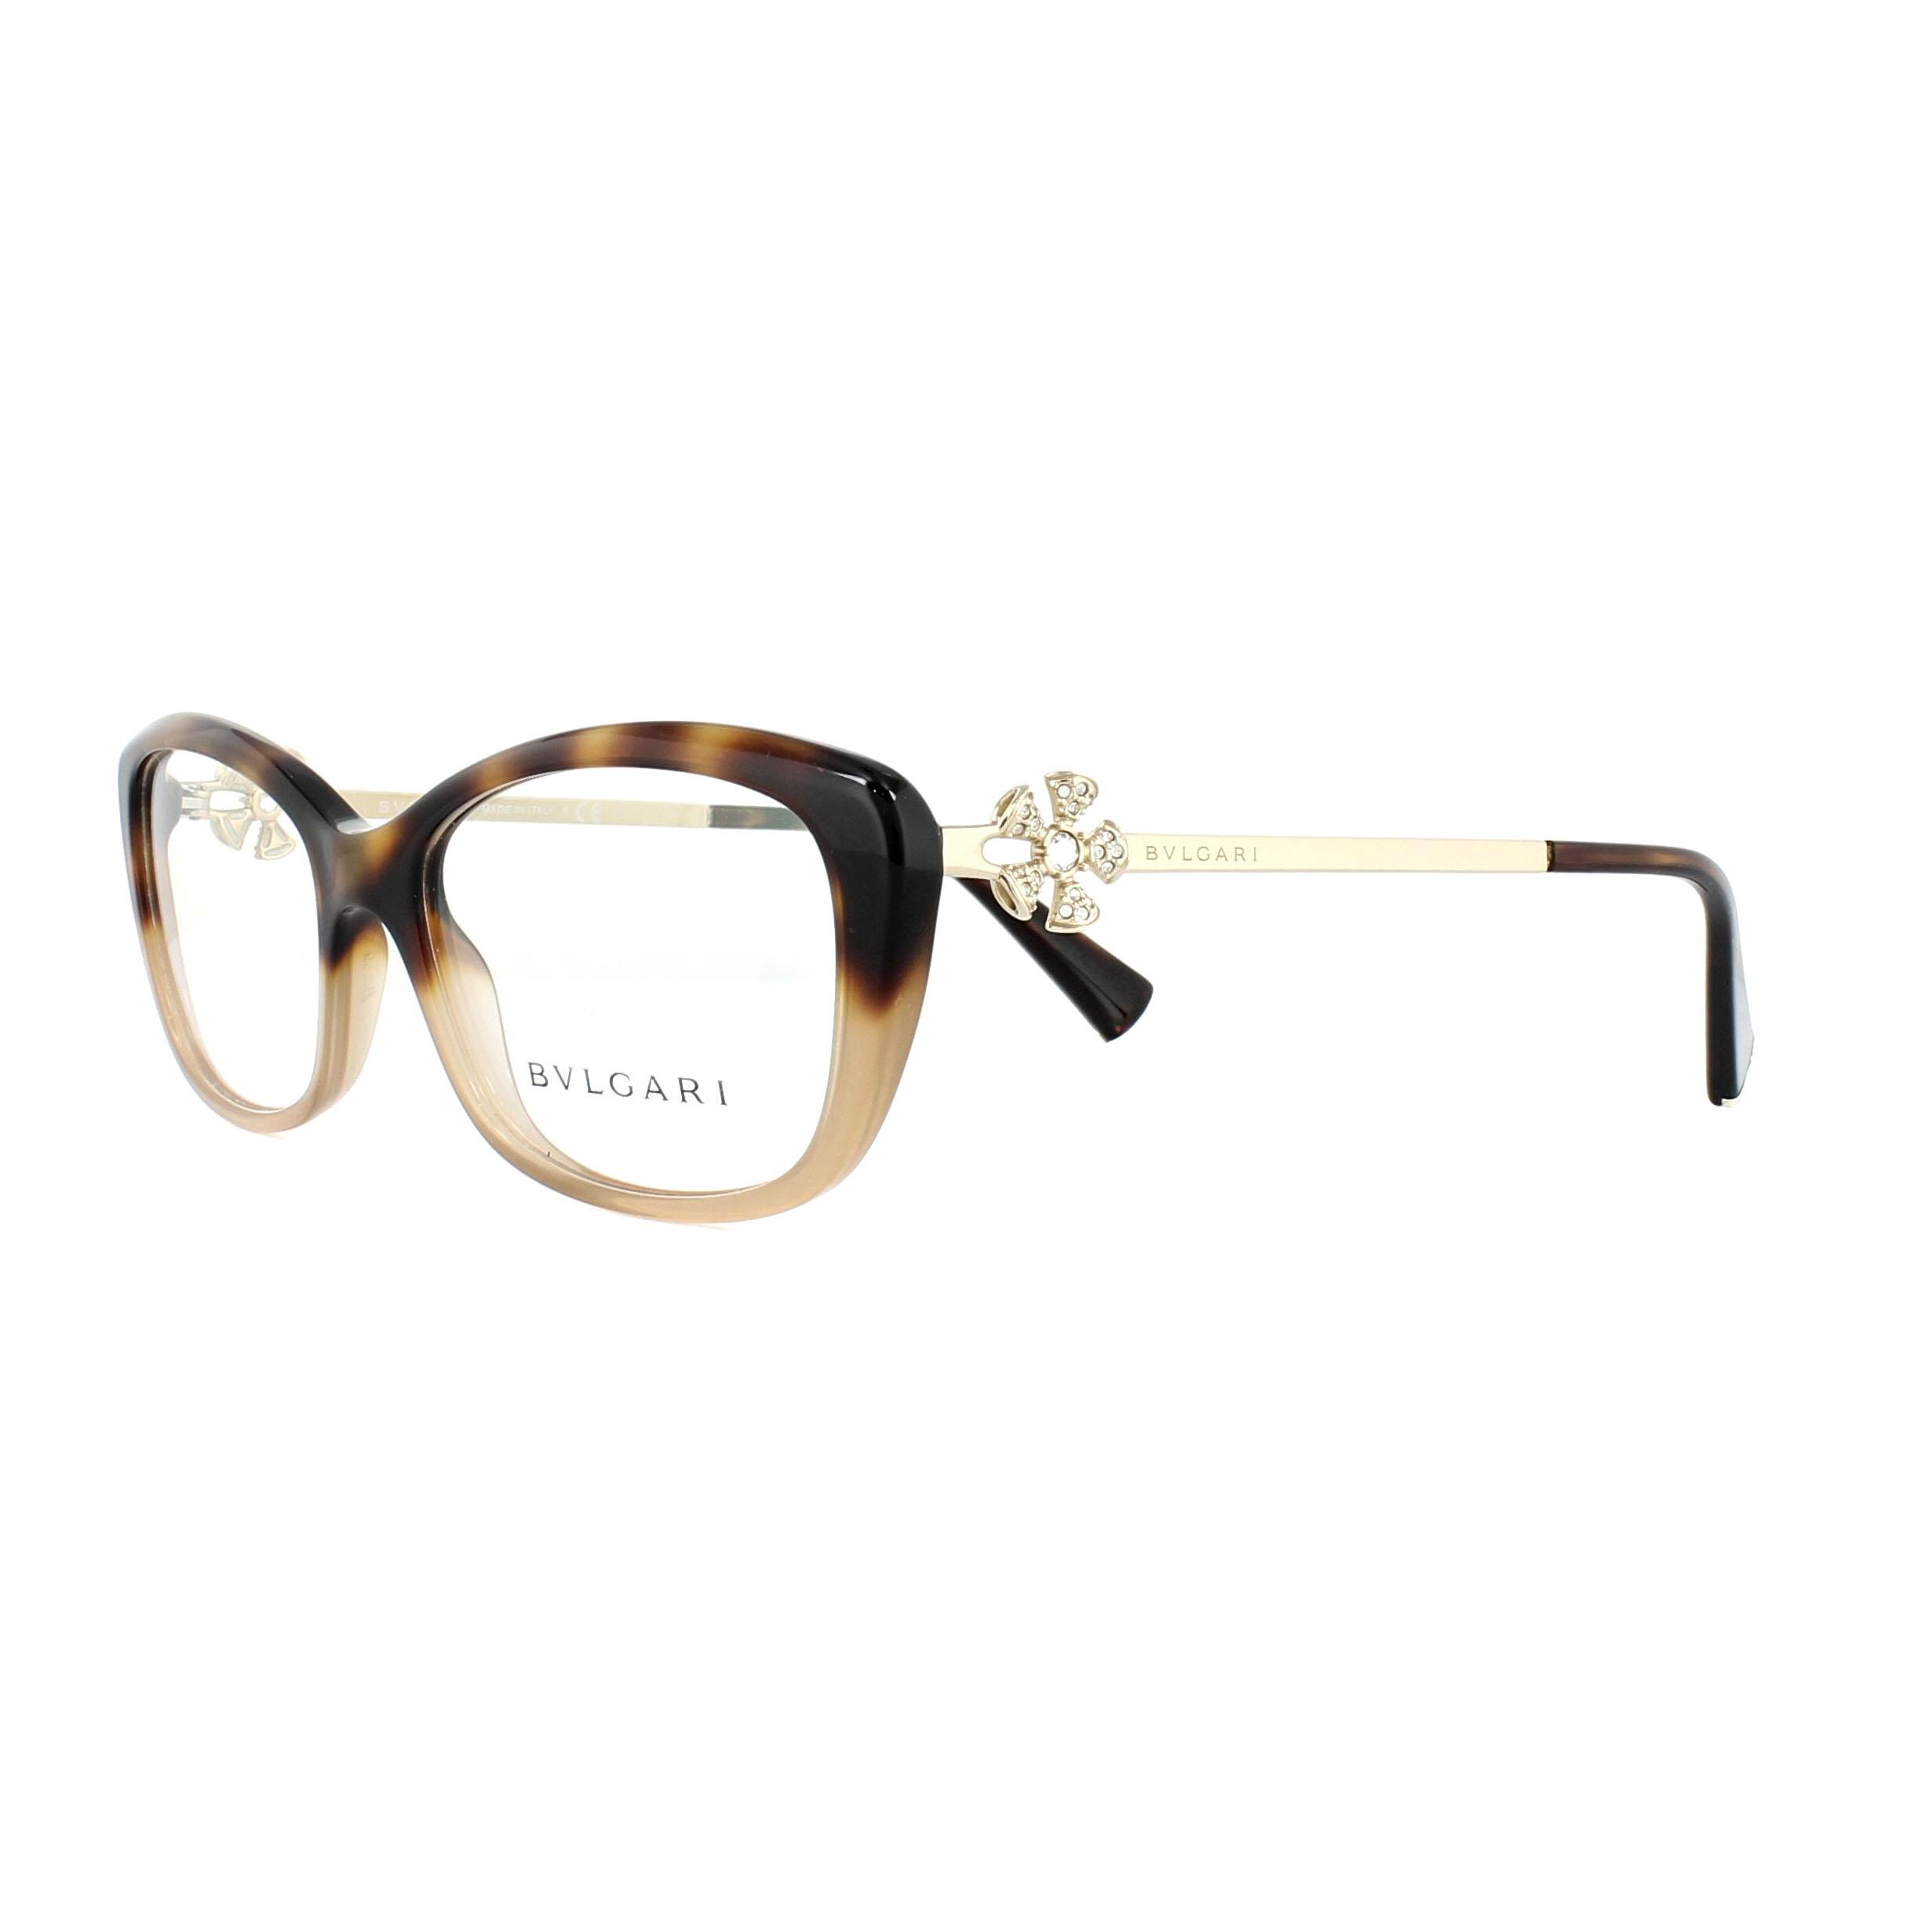 Bvlgari Glasses Frames 4145B 5362 Havana 53mm Womens 8053672766462 ...